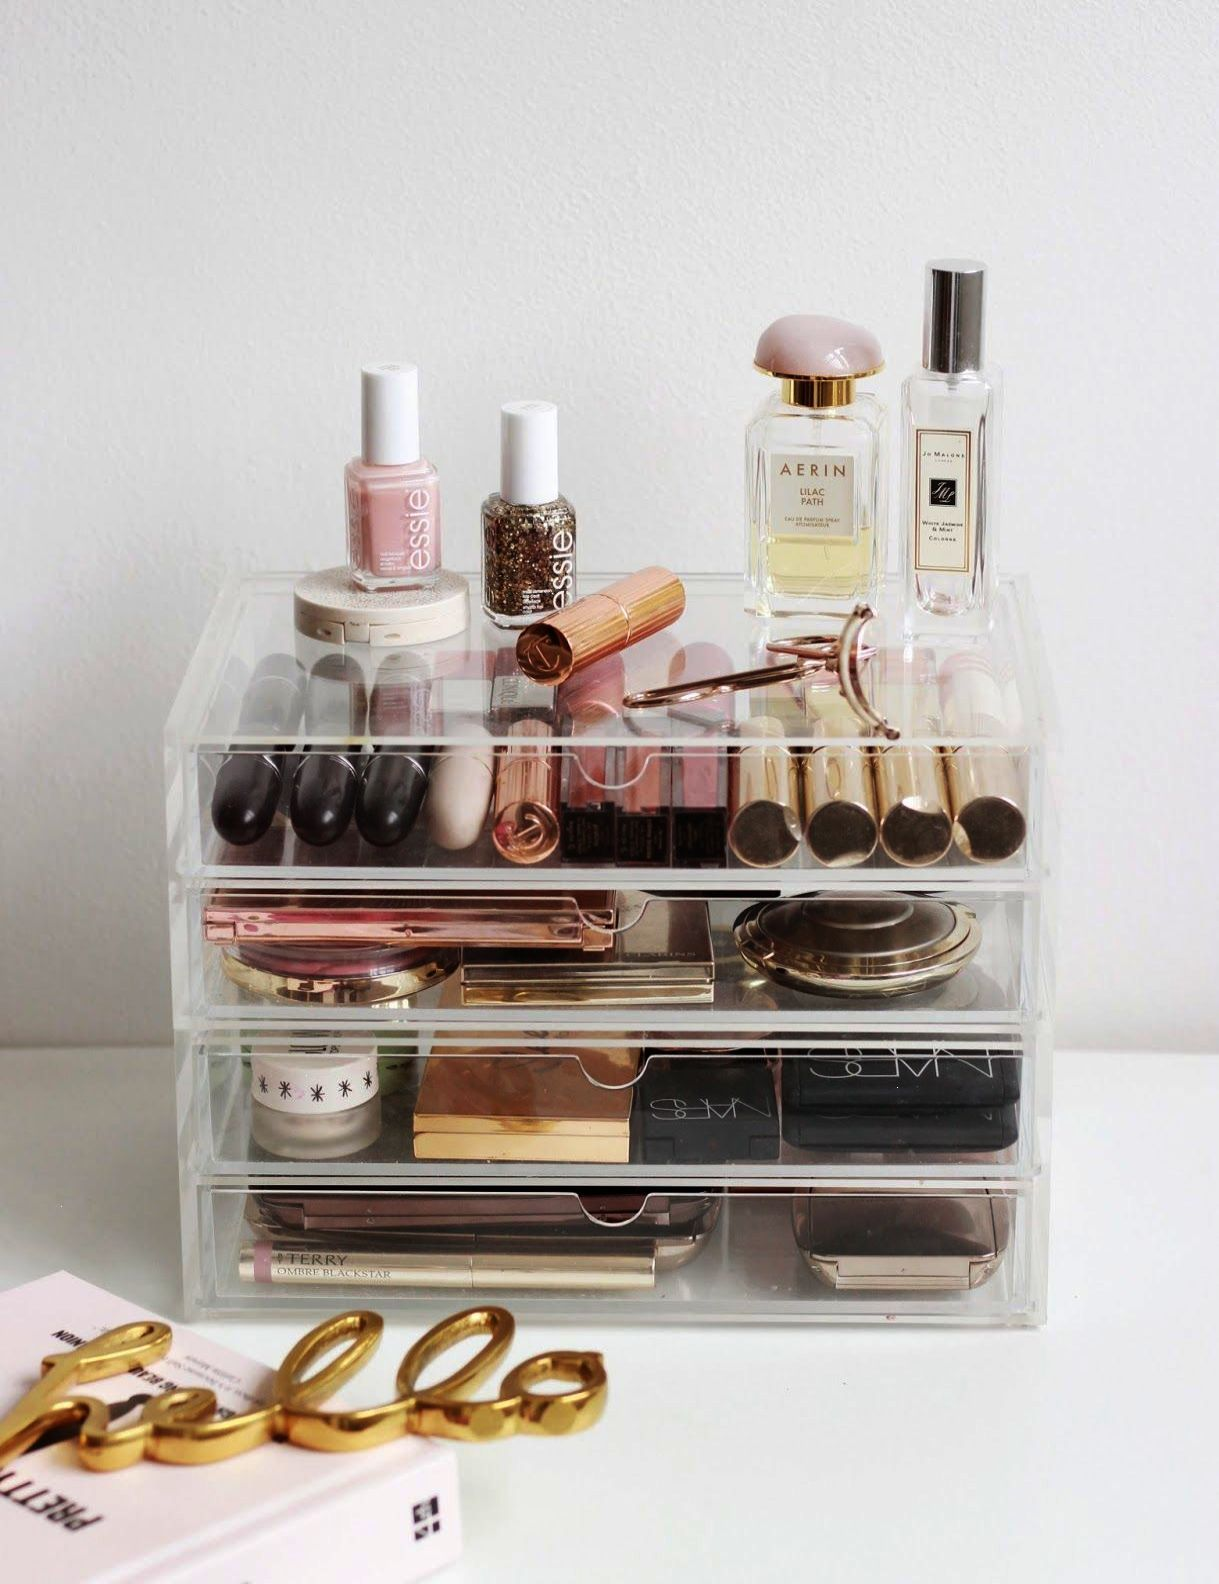 Muji Makeup Organizer Entrancing A Muji Makeup Storage Overhaul  Pint Sized Beauty  Interior Design Ideas